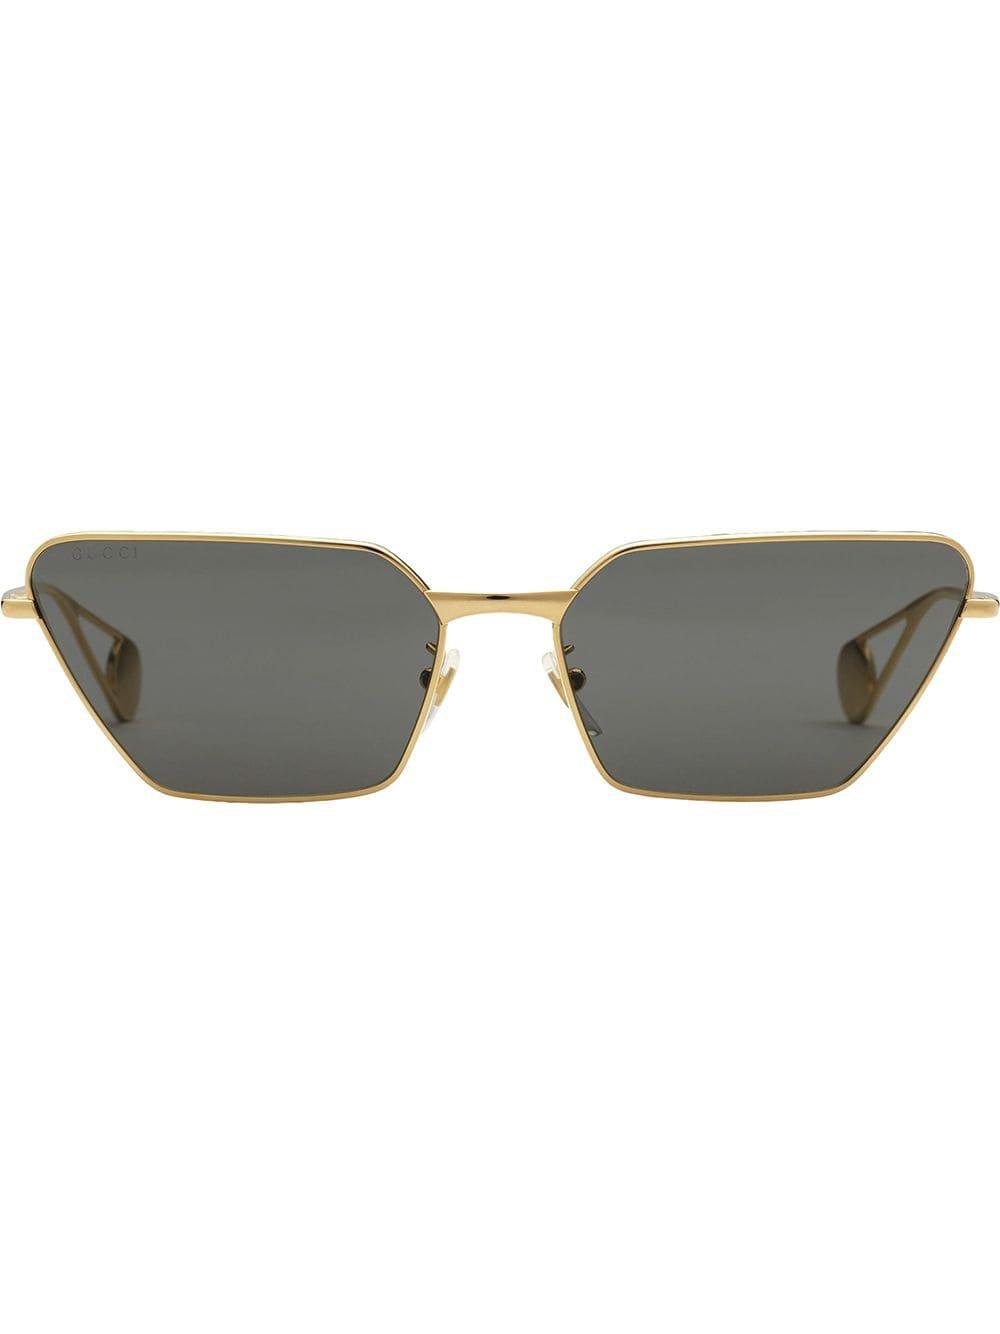 Gucci Eyewear Rectangular Sunglasses - Farfetch